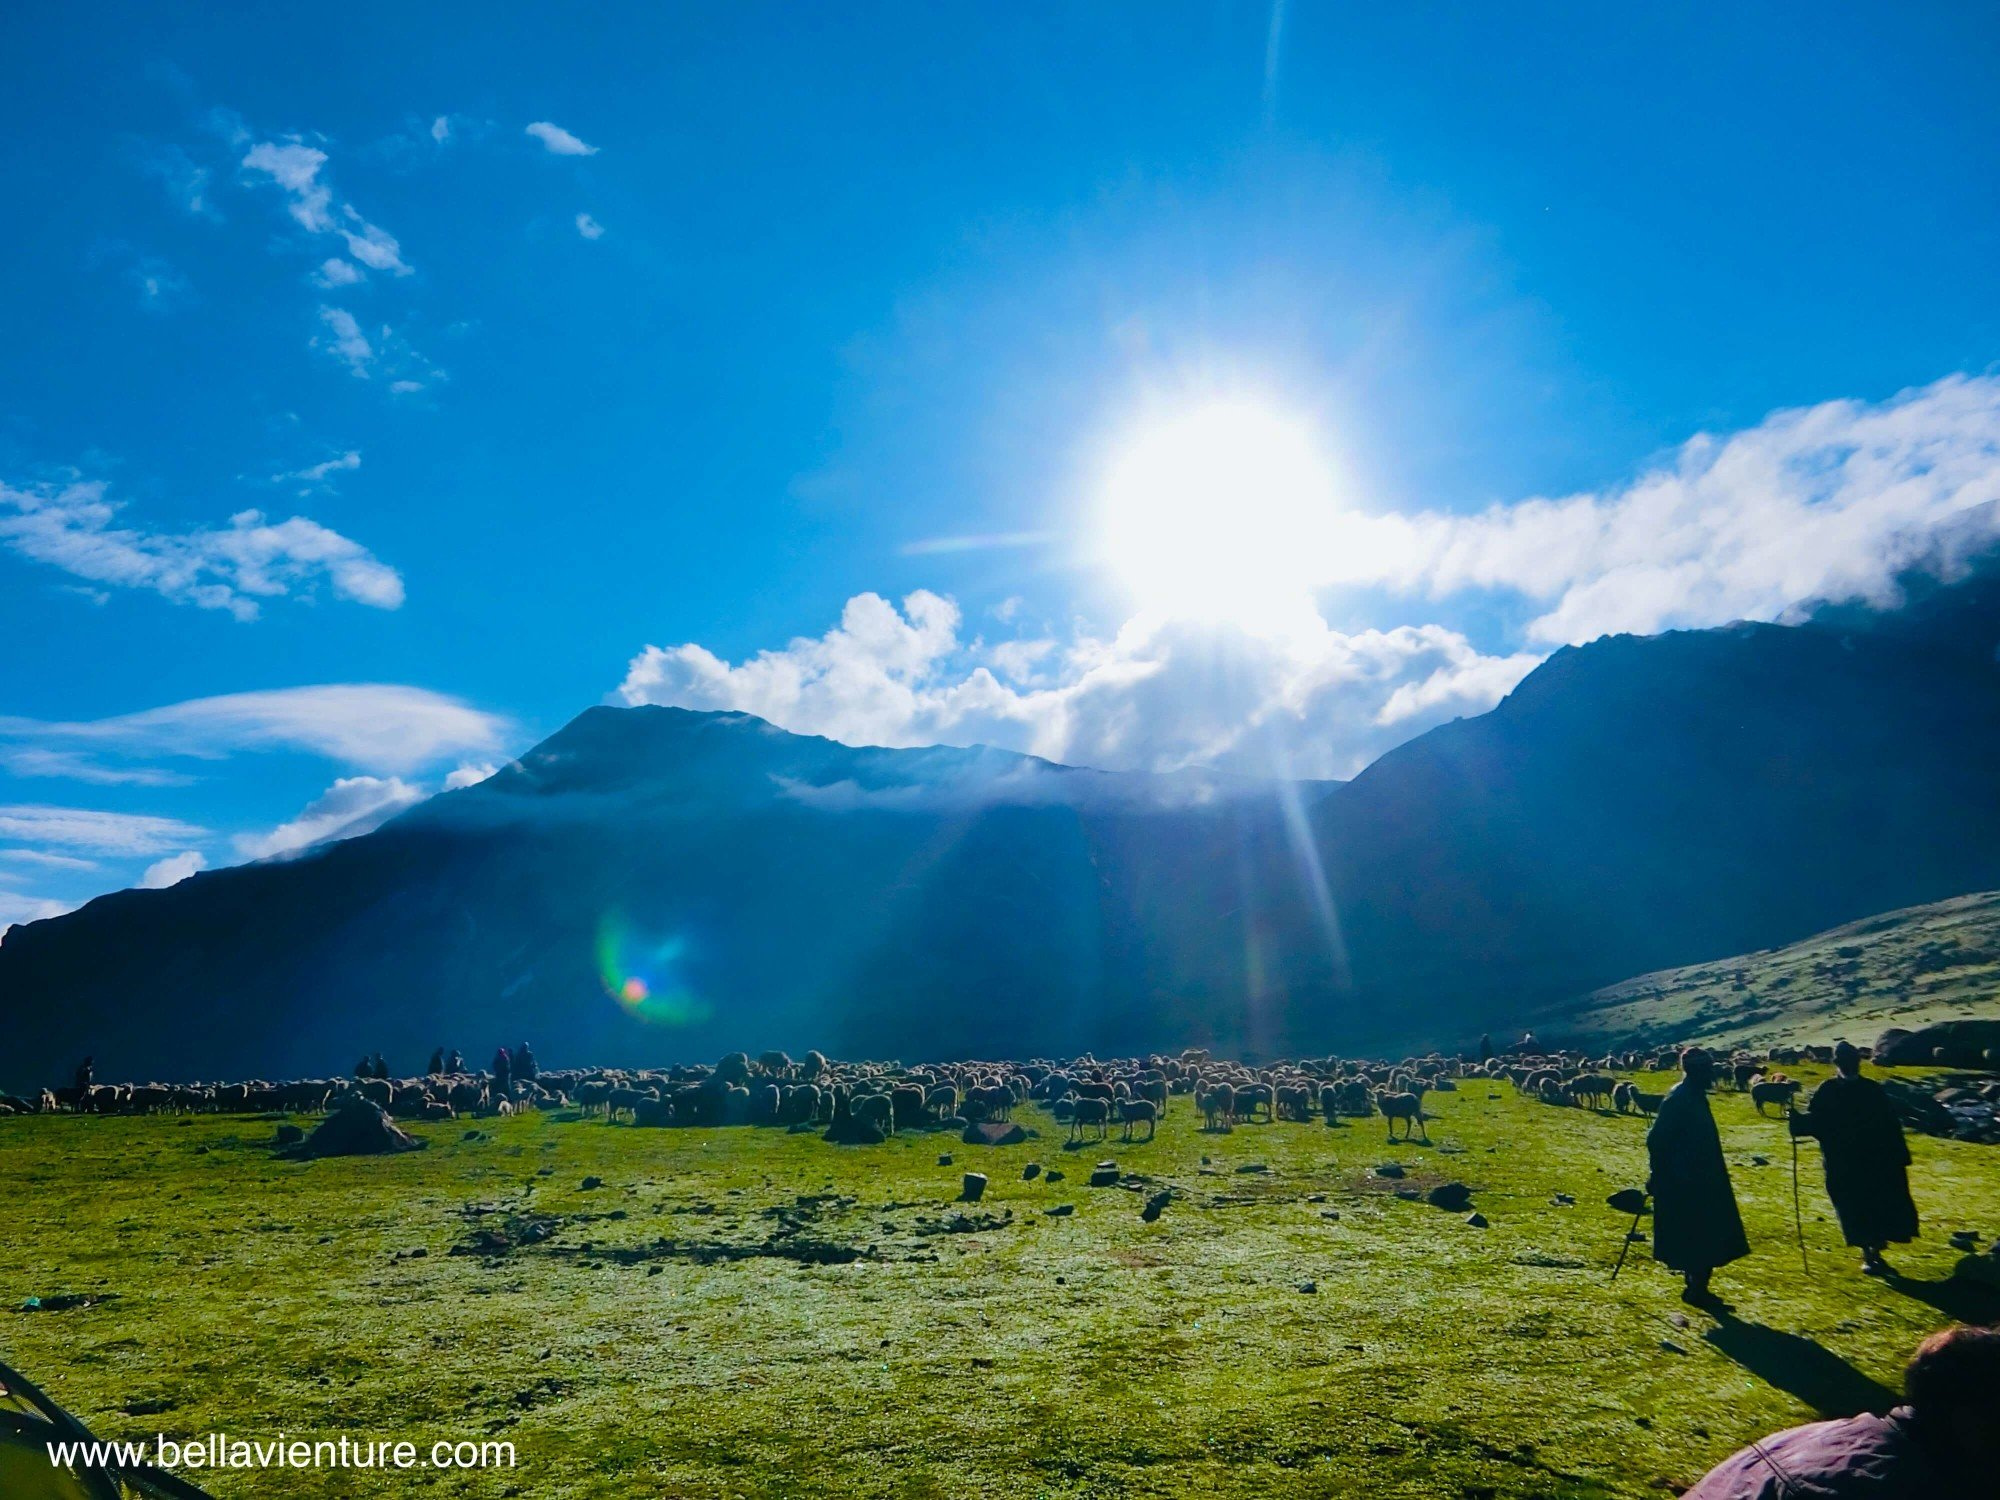 印度India 北北印North Inida 喀什米爾Kashmir 健行Trekking 大湖big lake 清晨